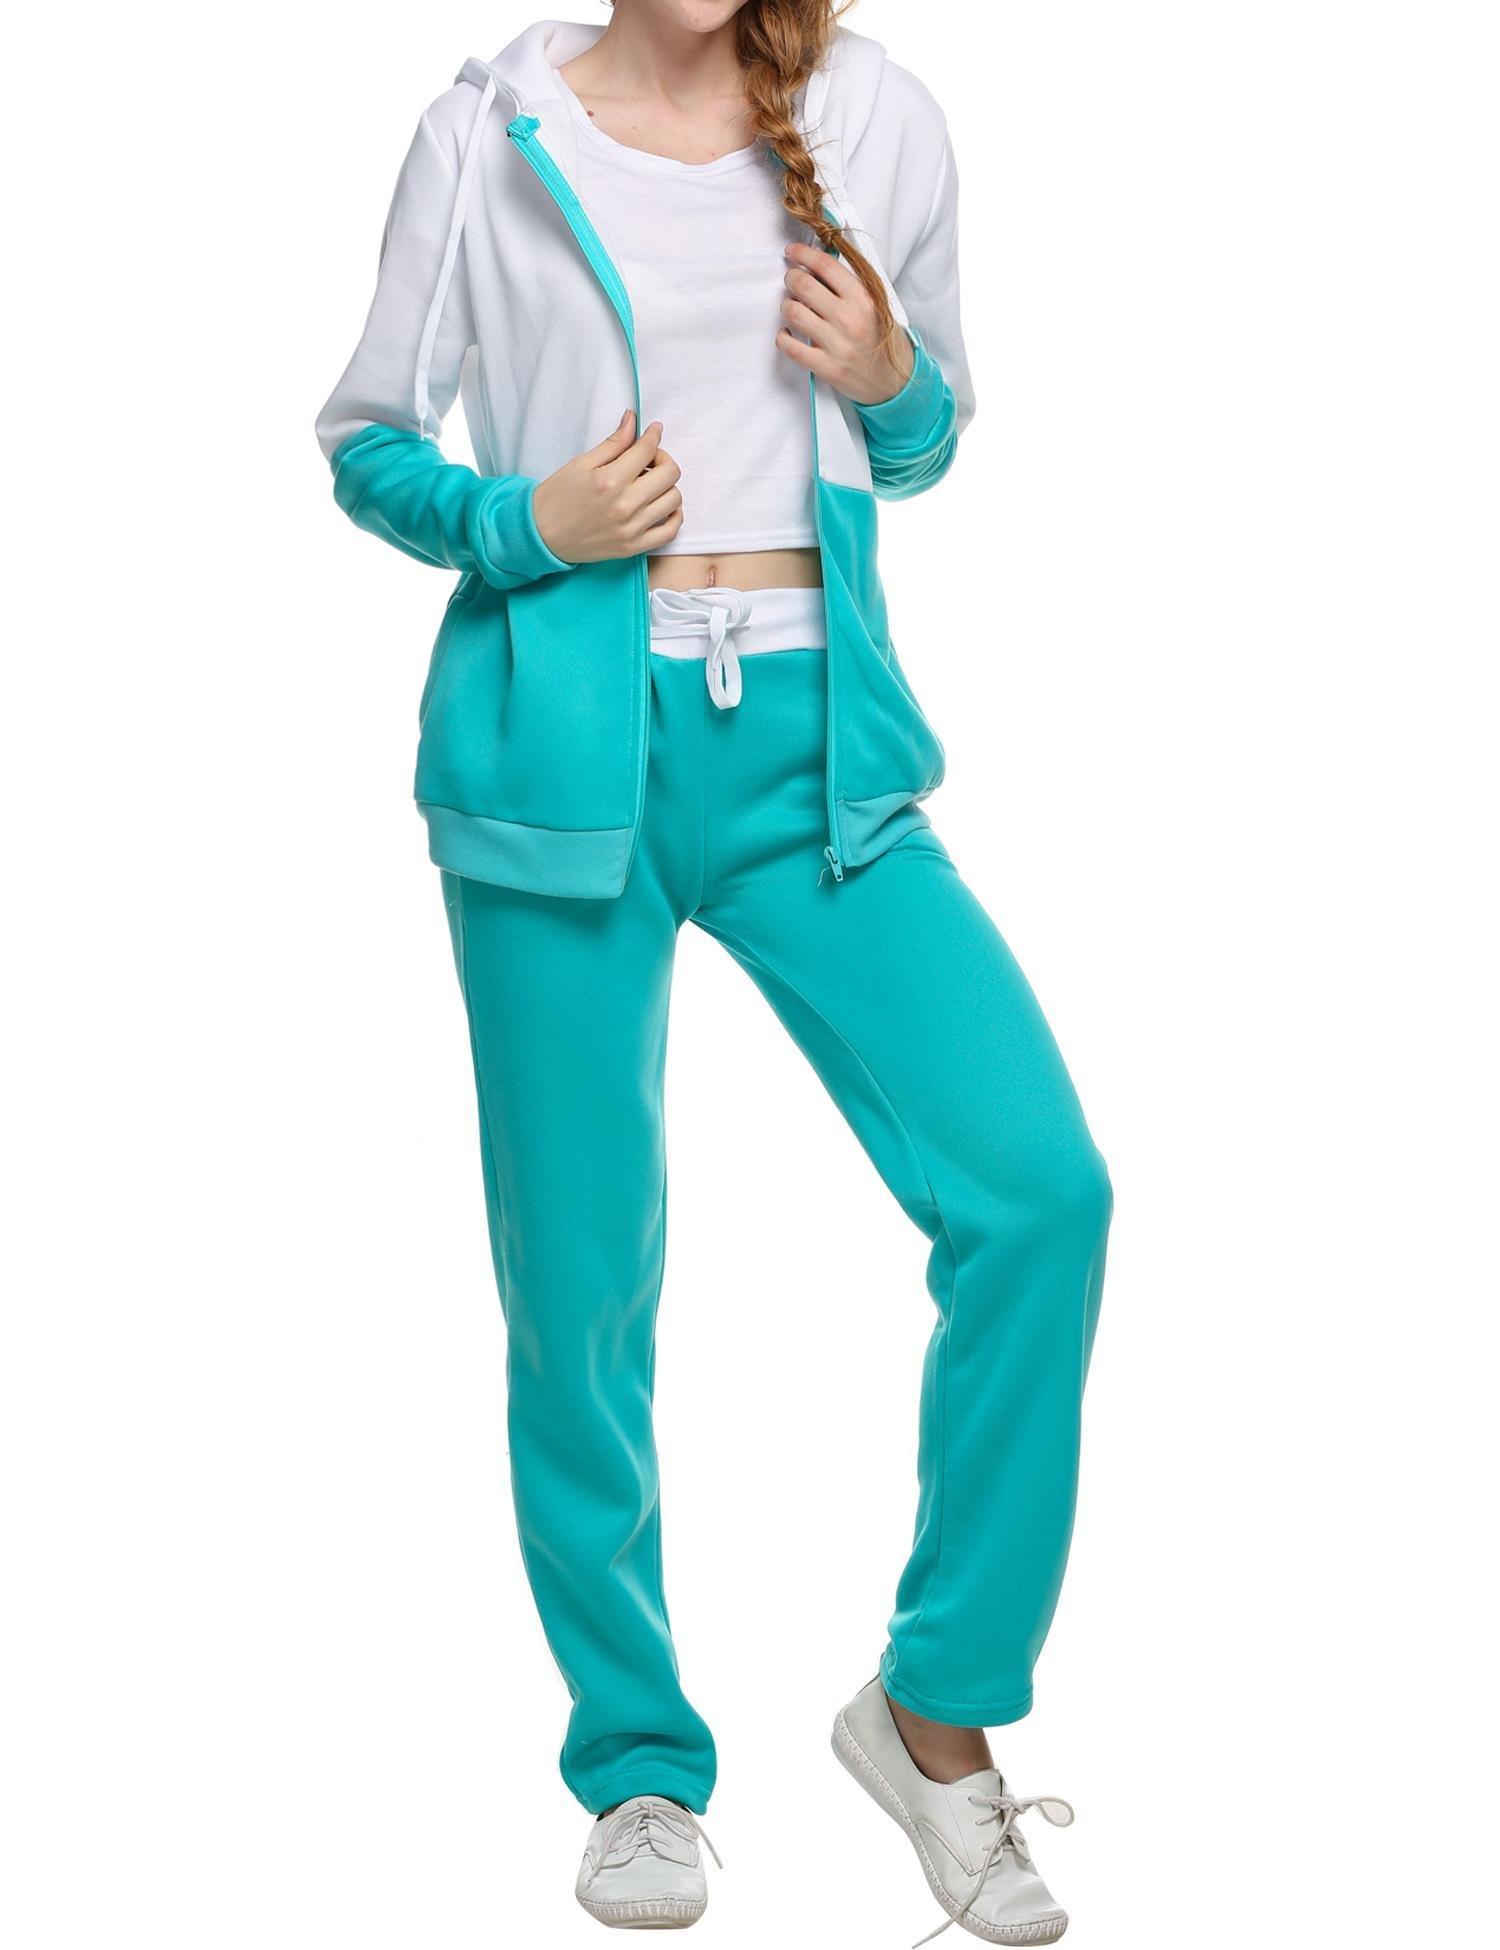 cindere Tracksuit For Women Two Piece Zip-up Sports Suit Hoodies Sweatshirt With Sweatpants